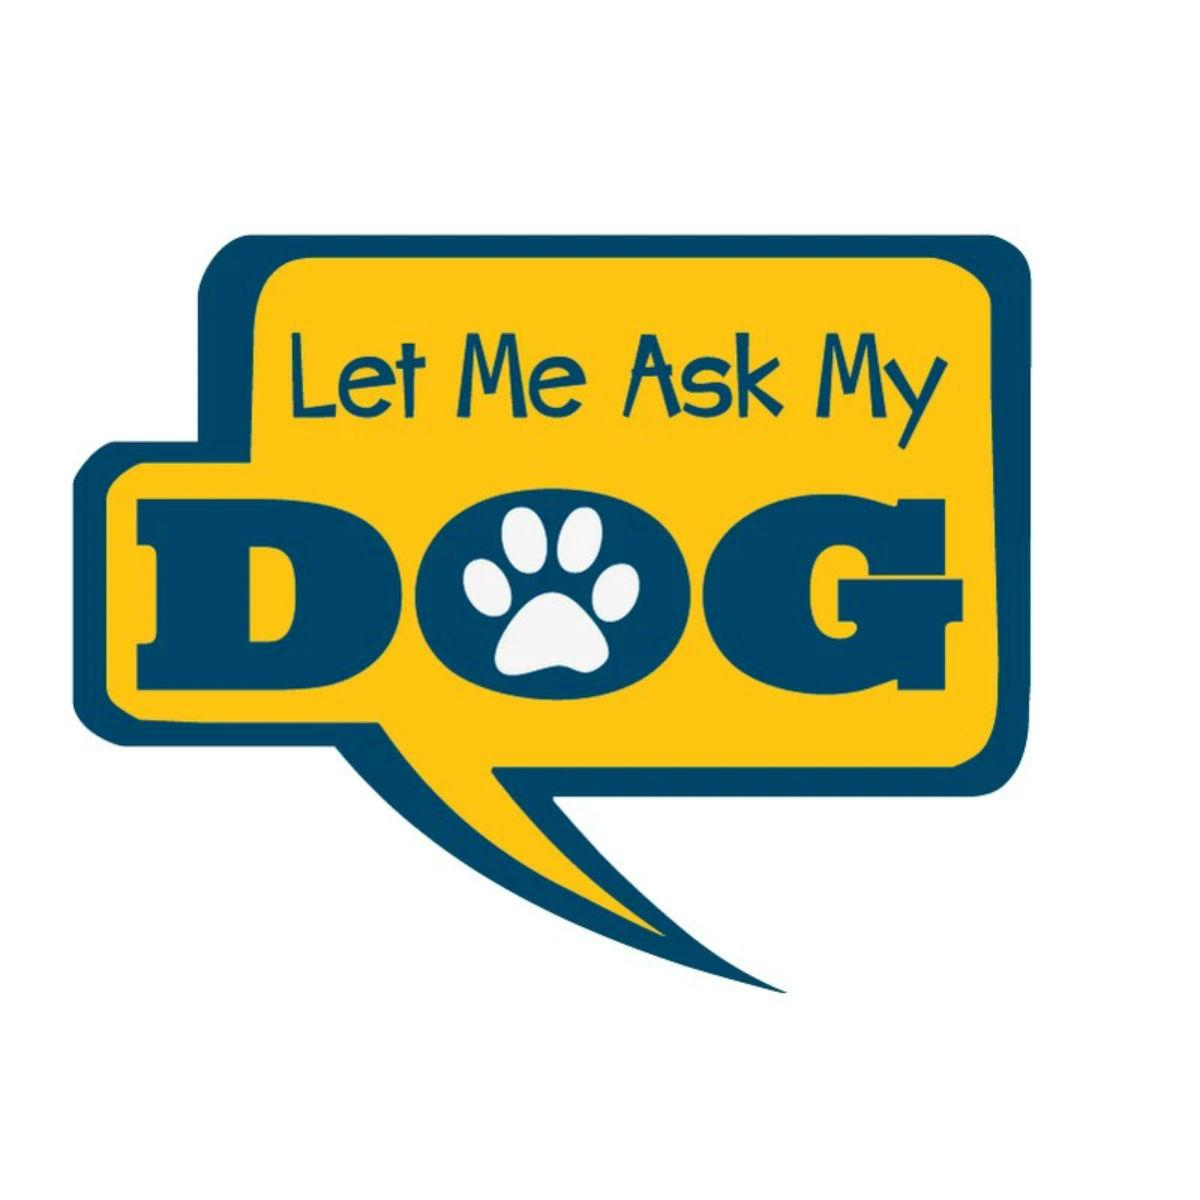 Let me ask my dog…. Sticker by Dog Speak